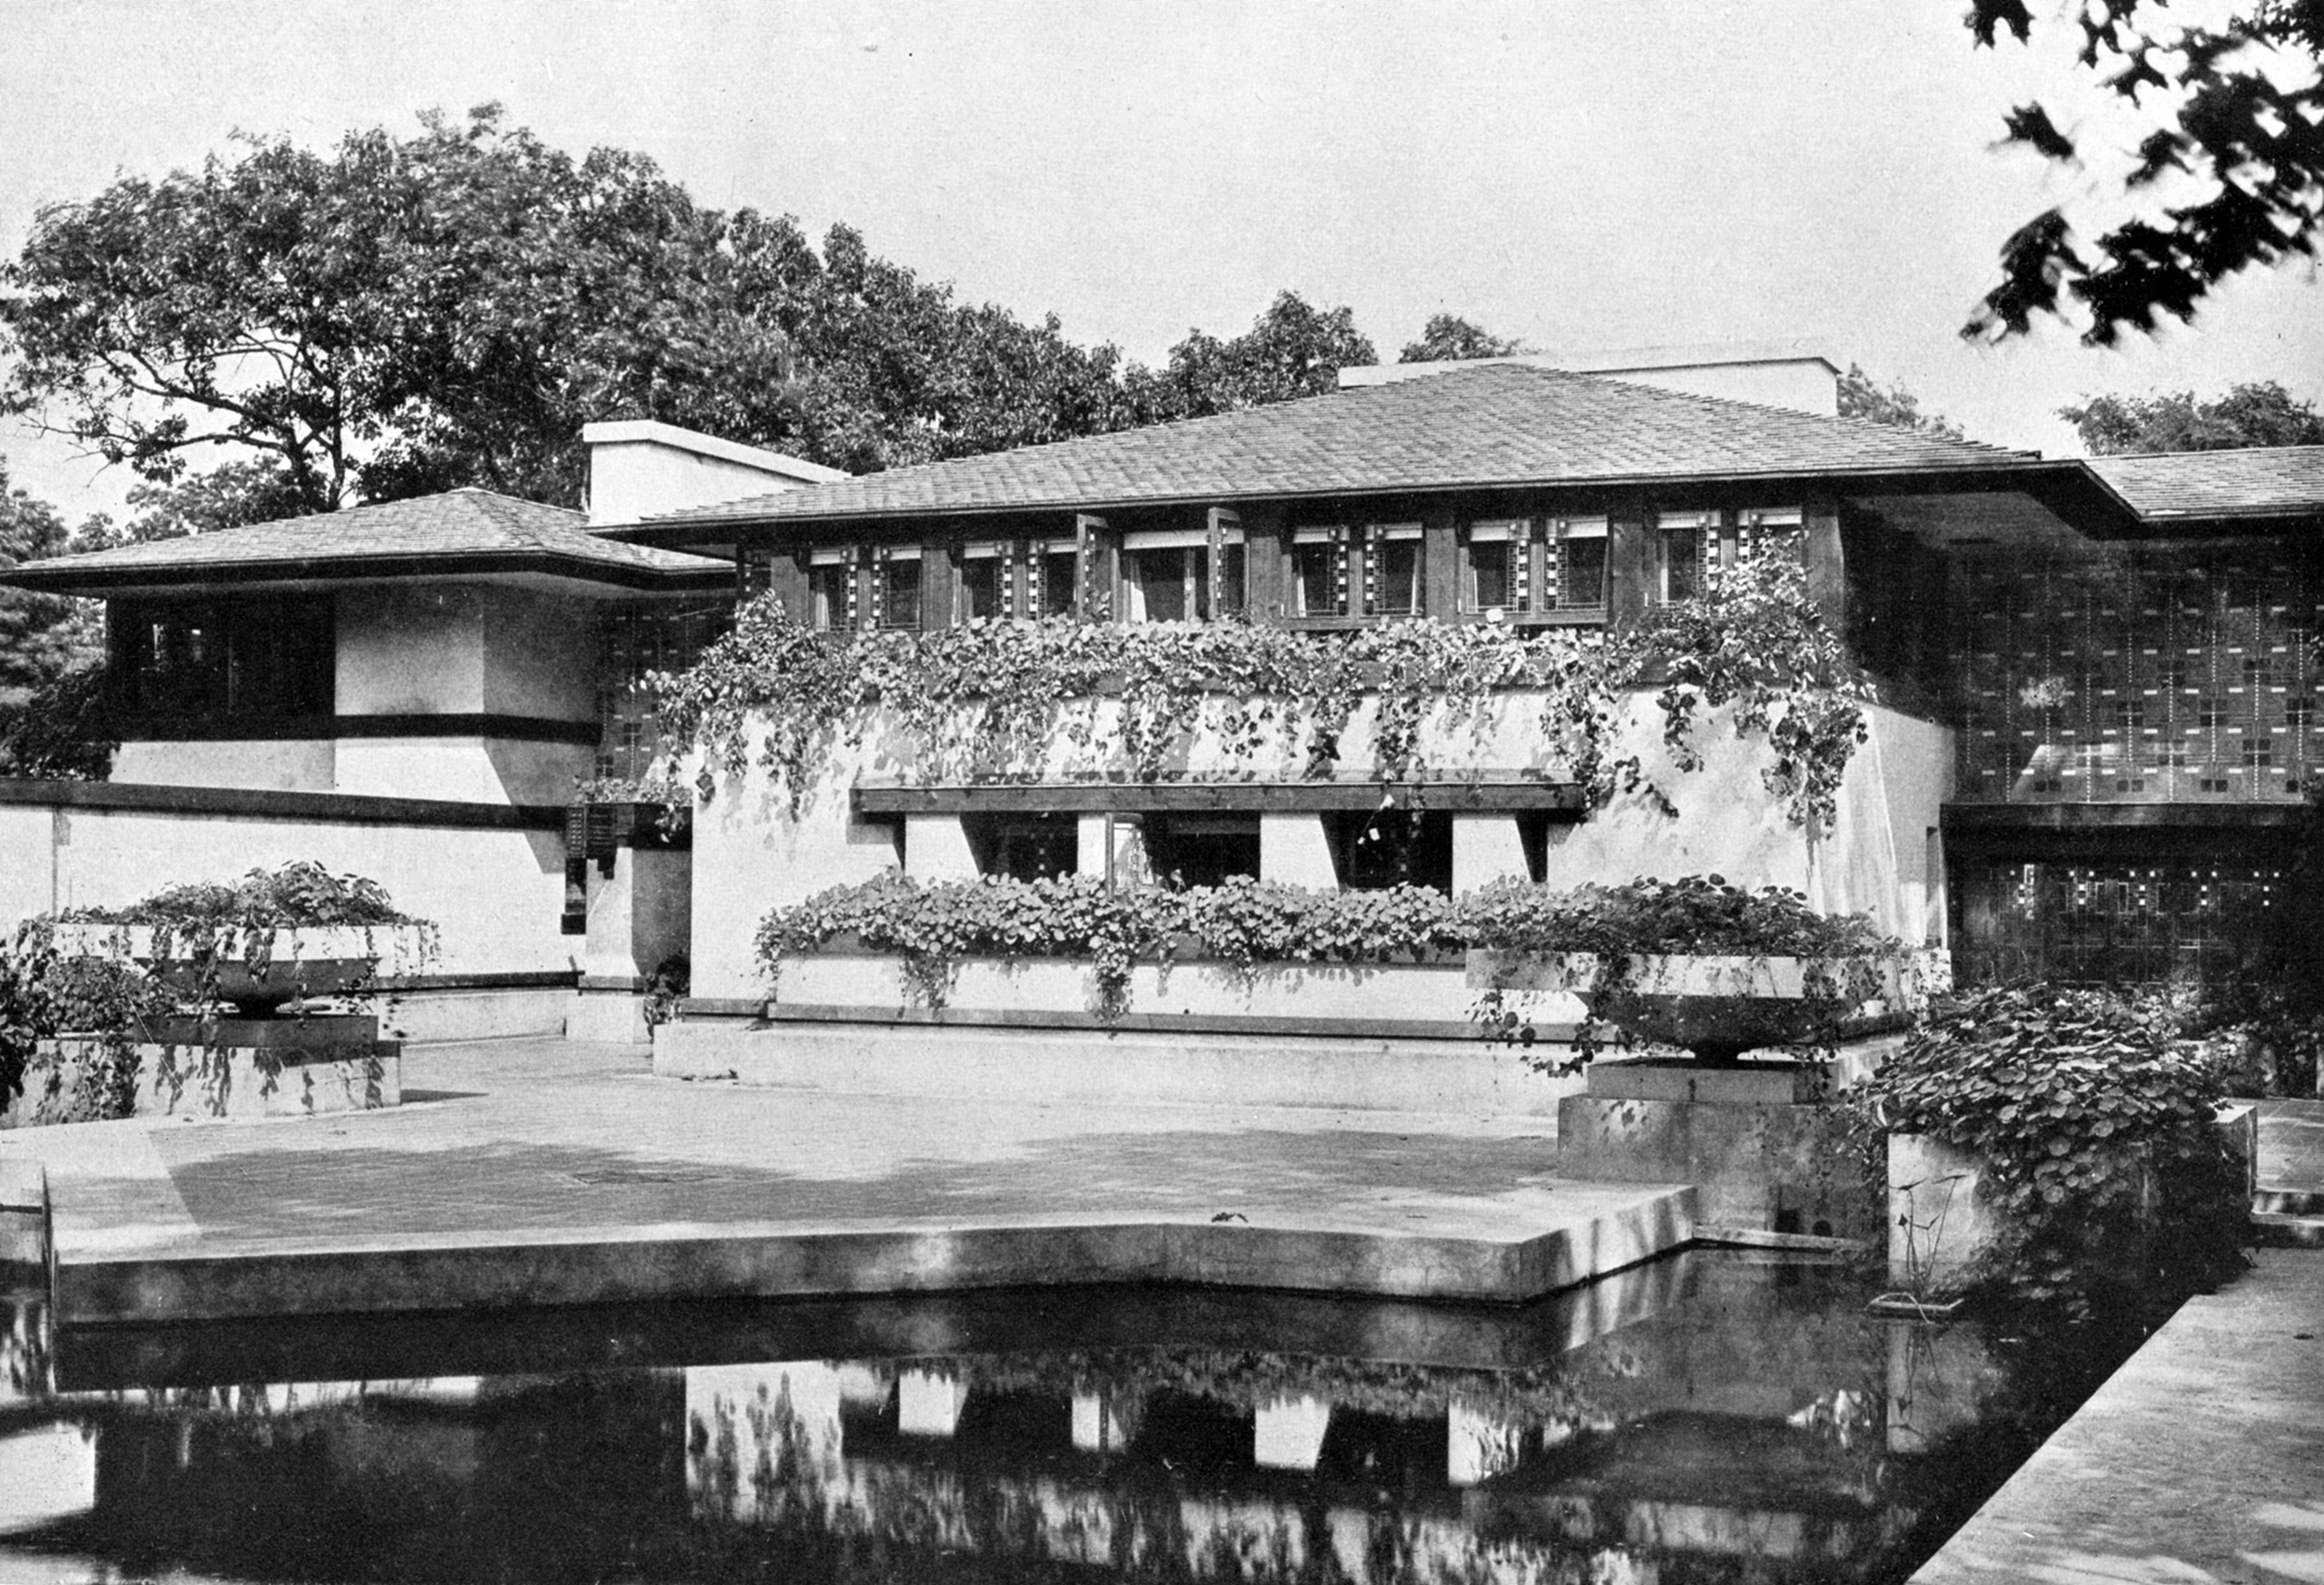 Frank Lloyd Wright's Avery Coonley house, Riverside, Ill. Built circa 1908.